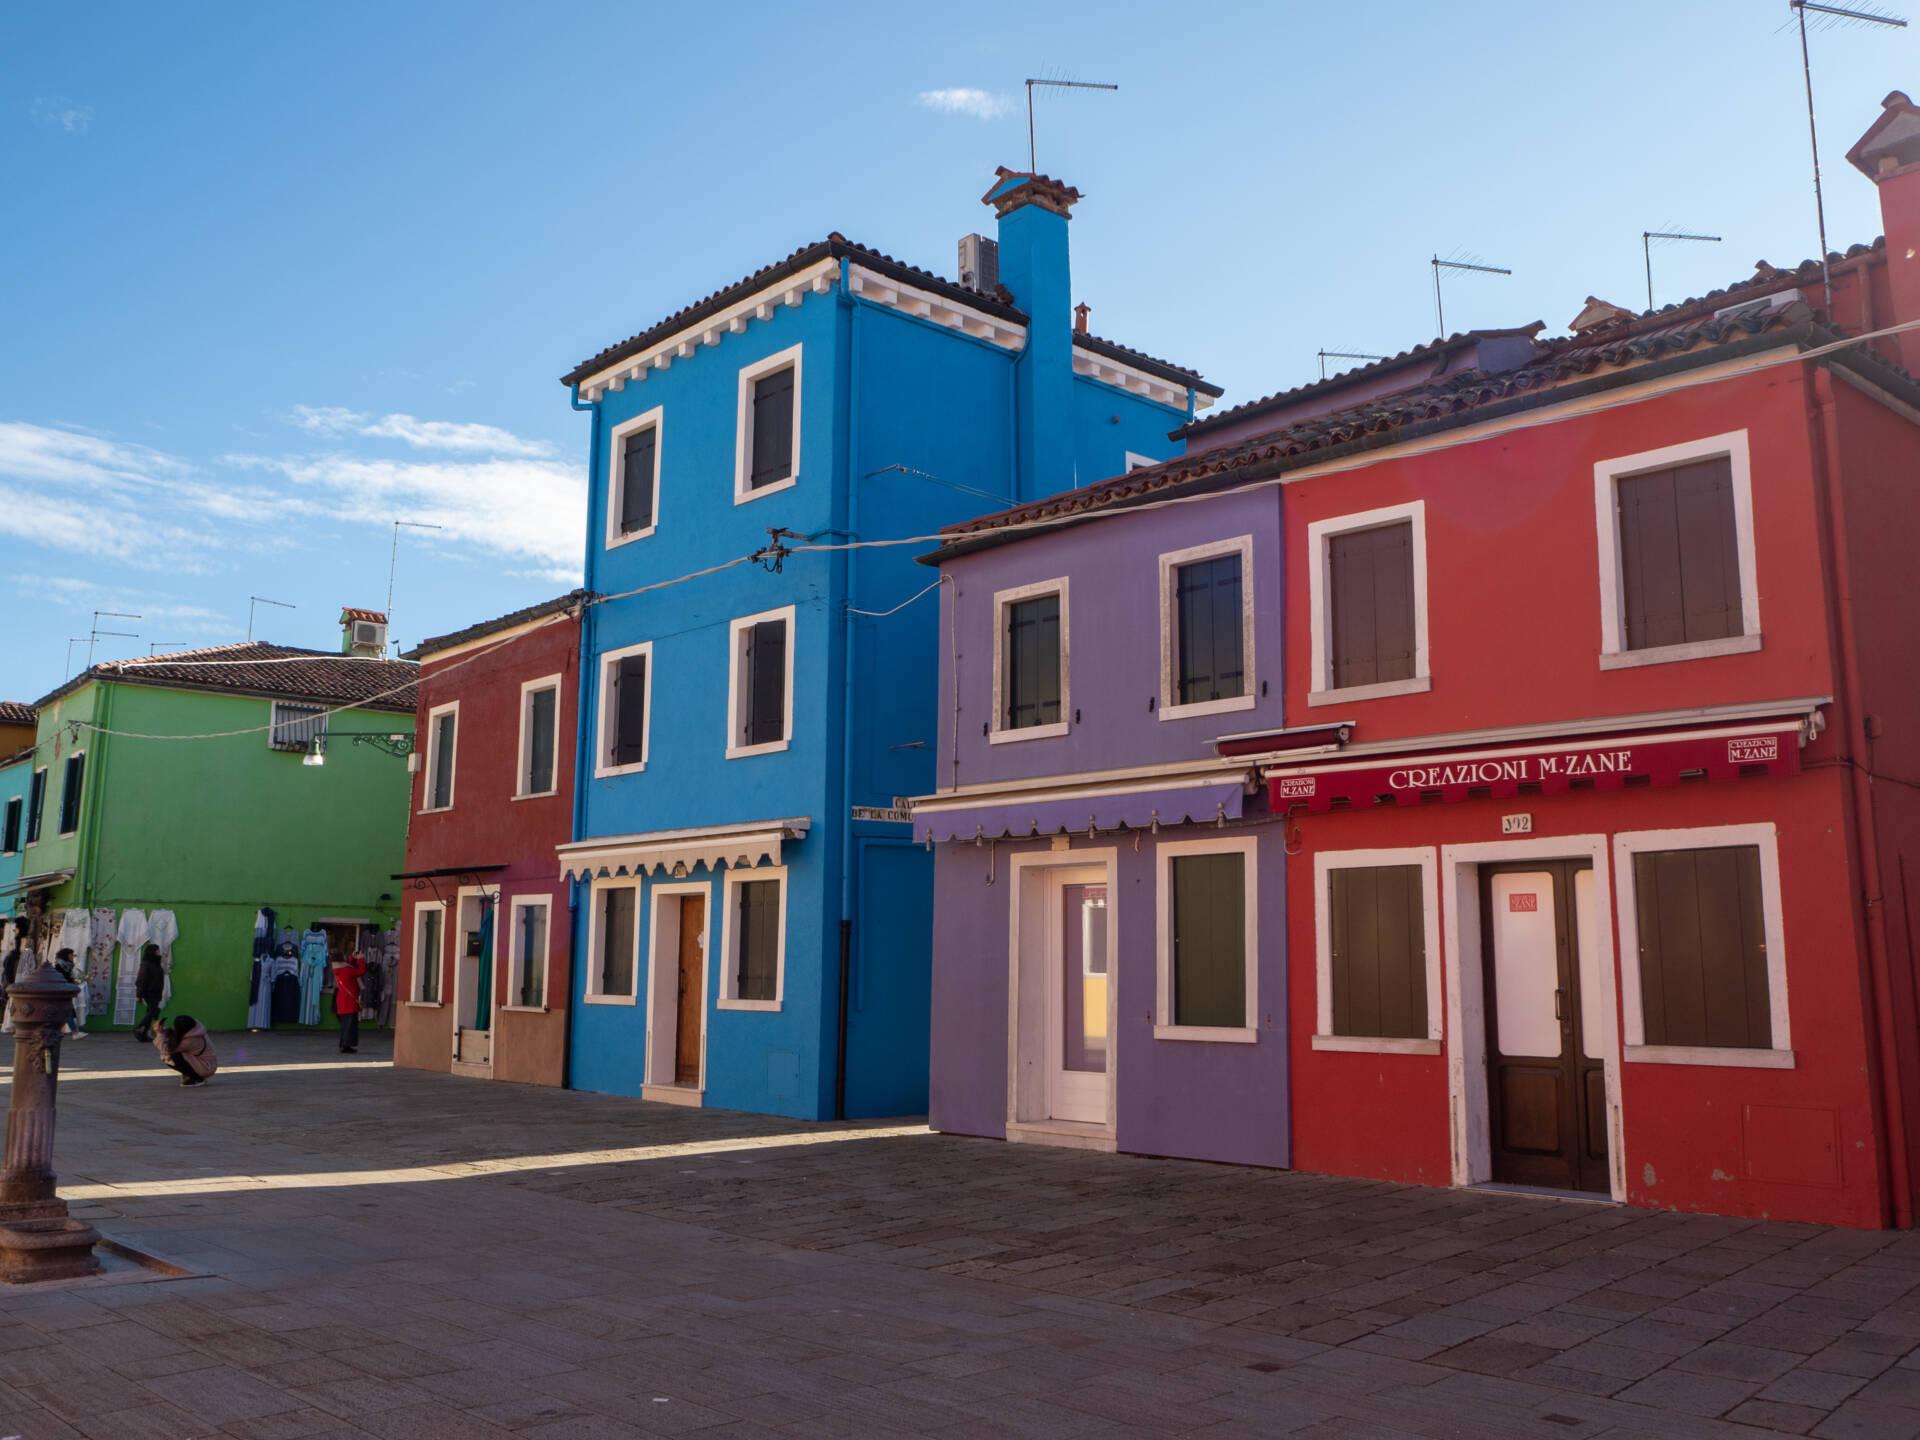 Venice on a budget - the island of Burano